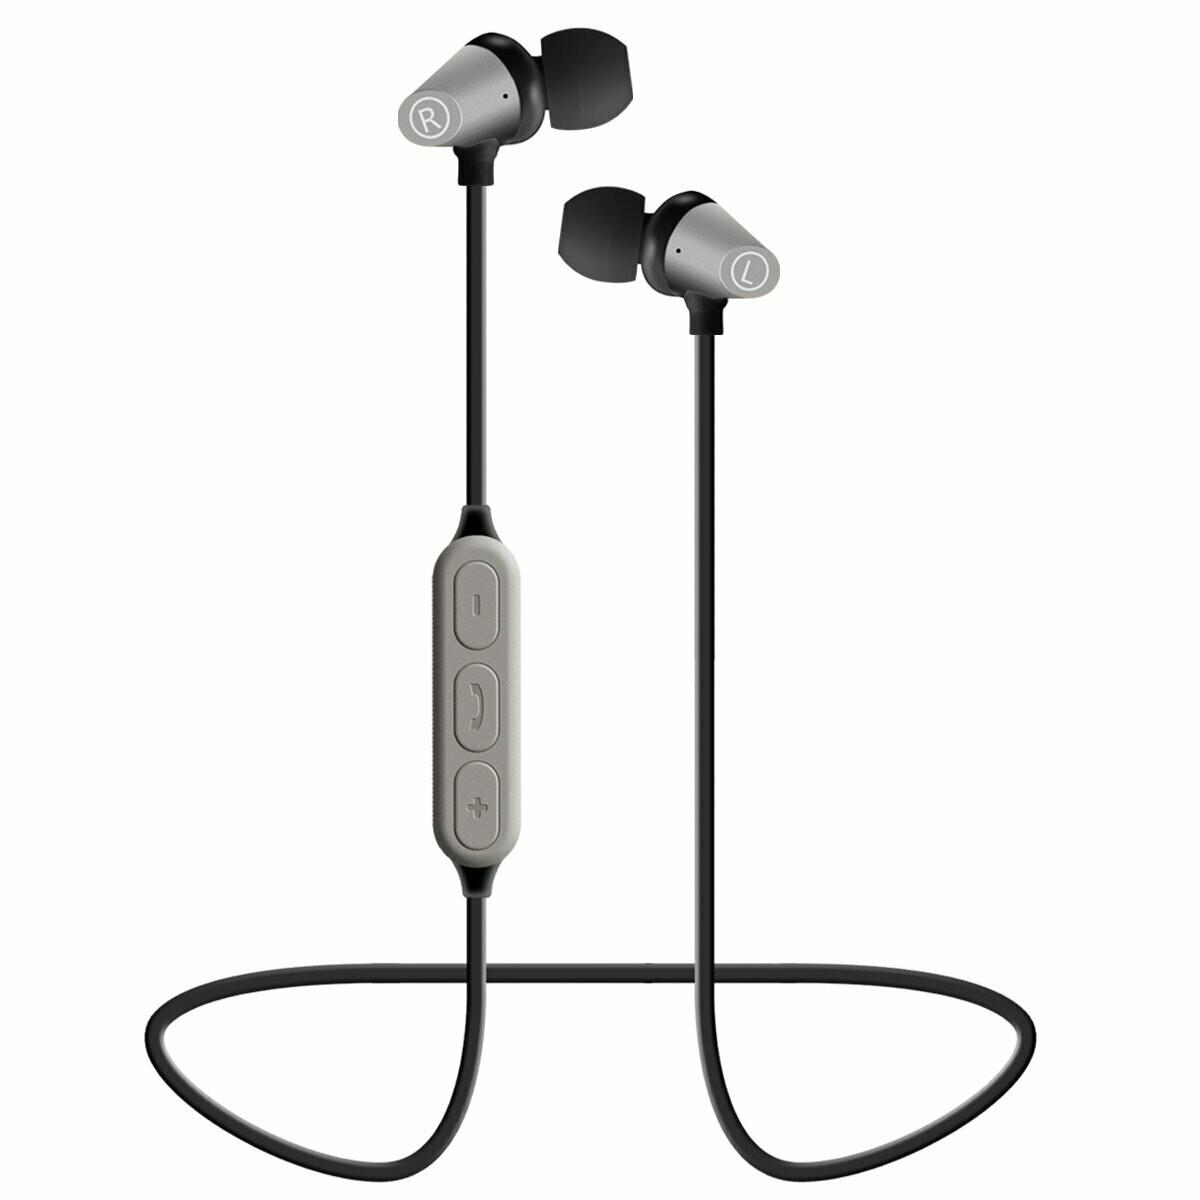 Bluetooth Headphones, Wallfire Best Wireless Sports Earphones w/Mic 4.1 Stereo Sweatproof Earbuds for Gym Running Playtime, Magnetic Bluetooth Headset